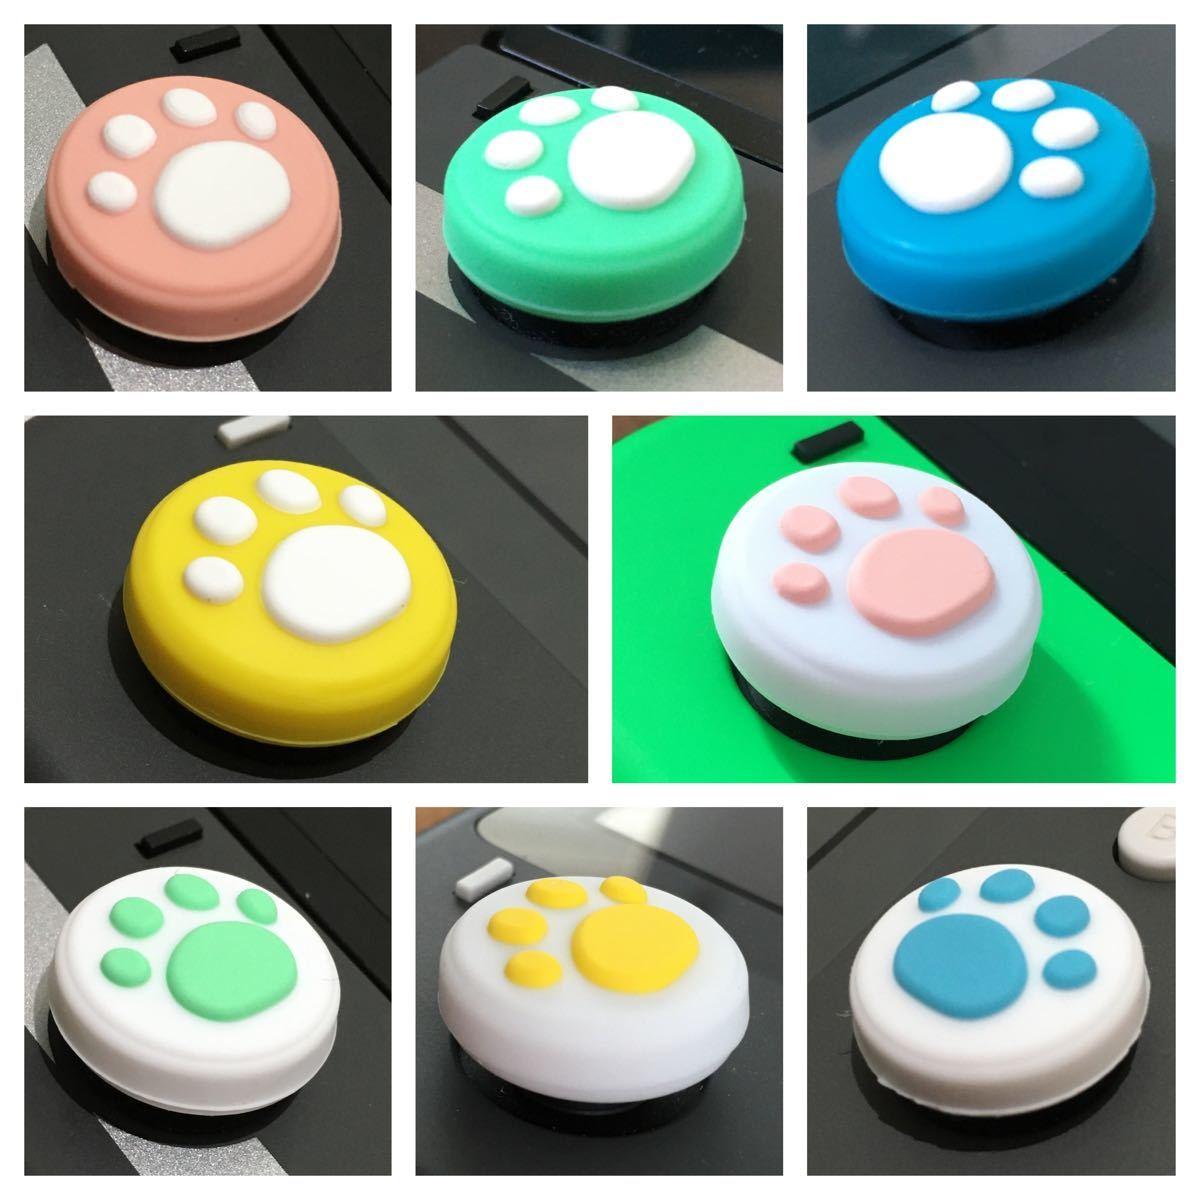 Nintendo Switch スイッチ ジョイコン スティックカバー 肉球 4個セット 色の組み合わせ自由